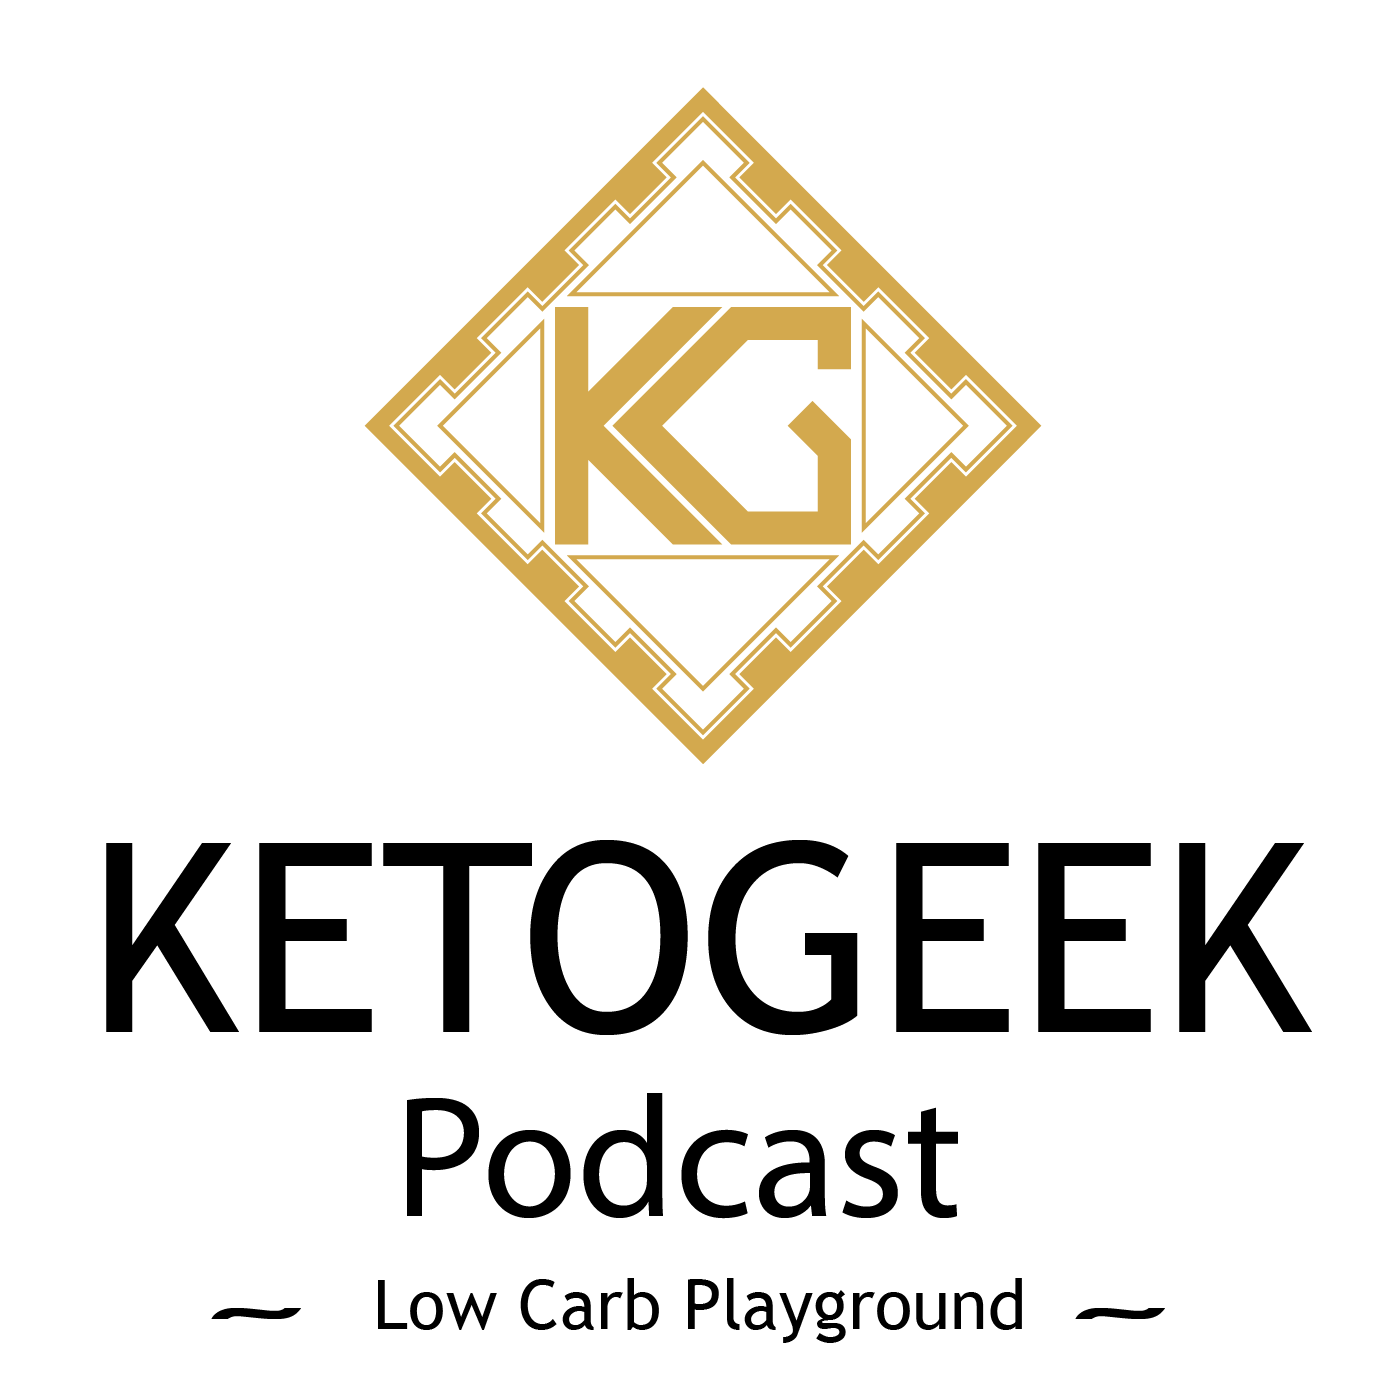 Ketogeek's Podcast show art